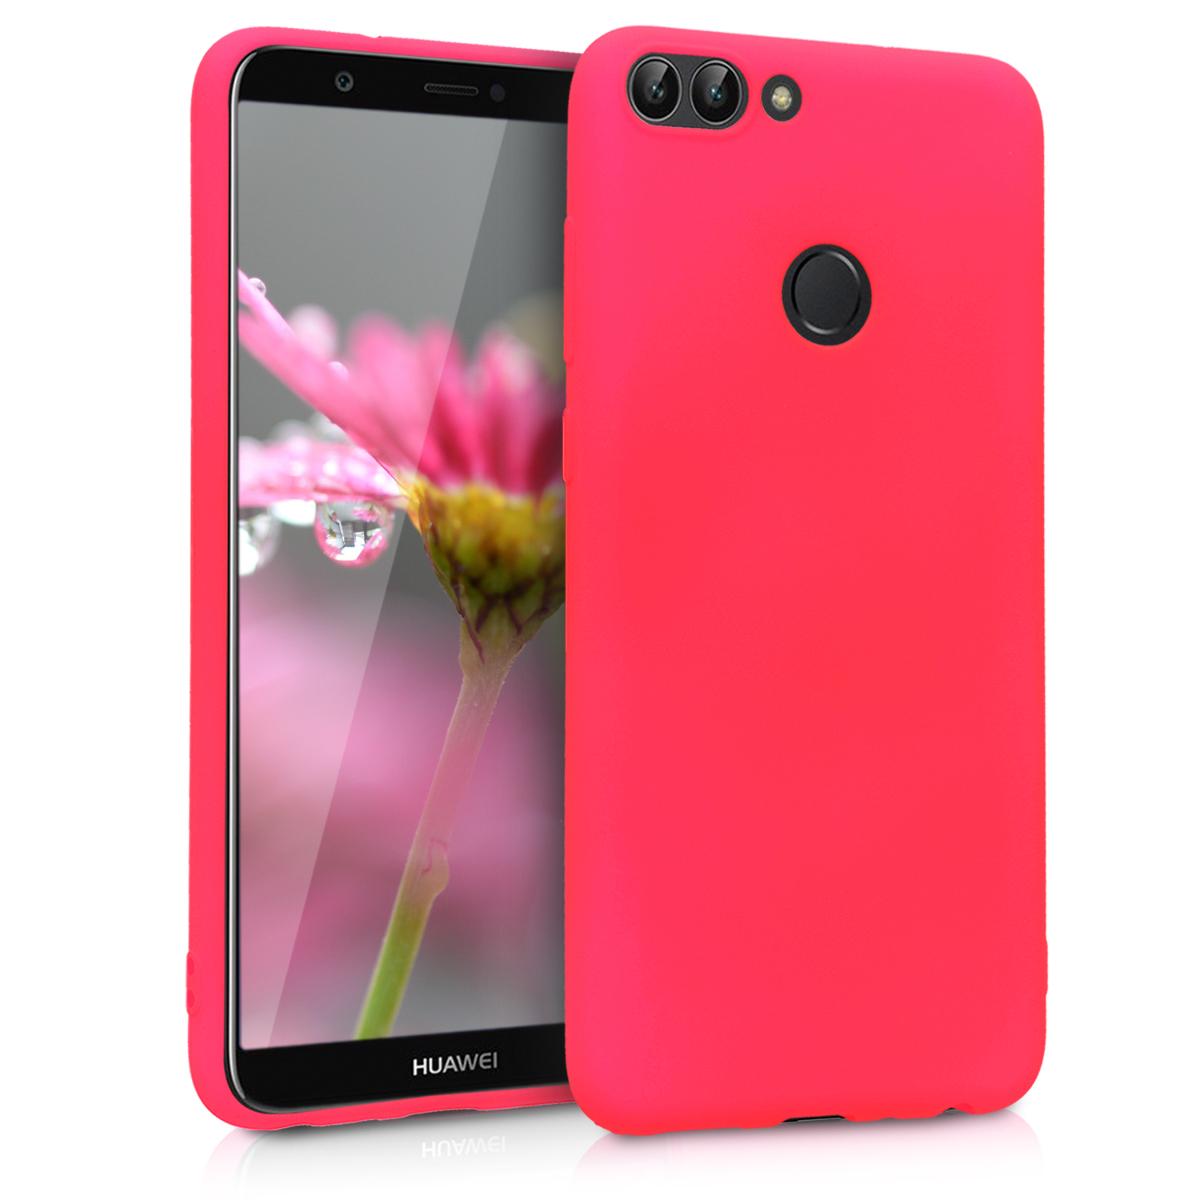 KW Θήκη Σιλικόνης Huawei P Smart 2018 - Neon Pink (44124.77)